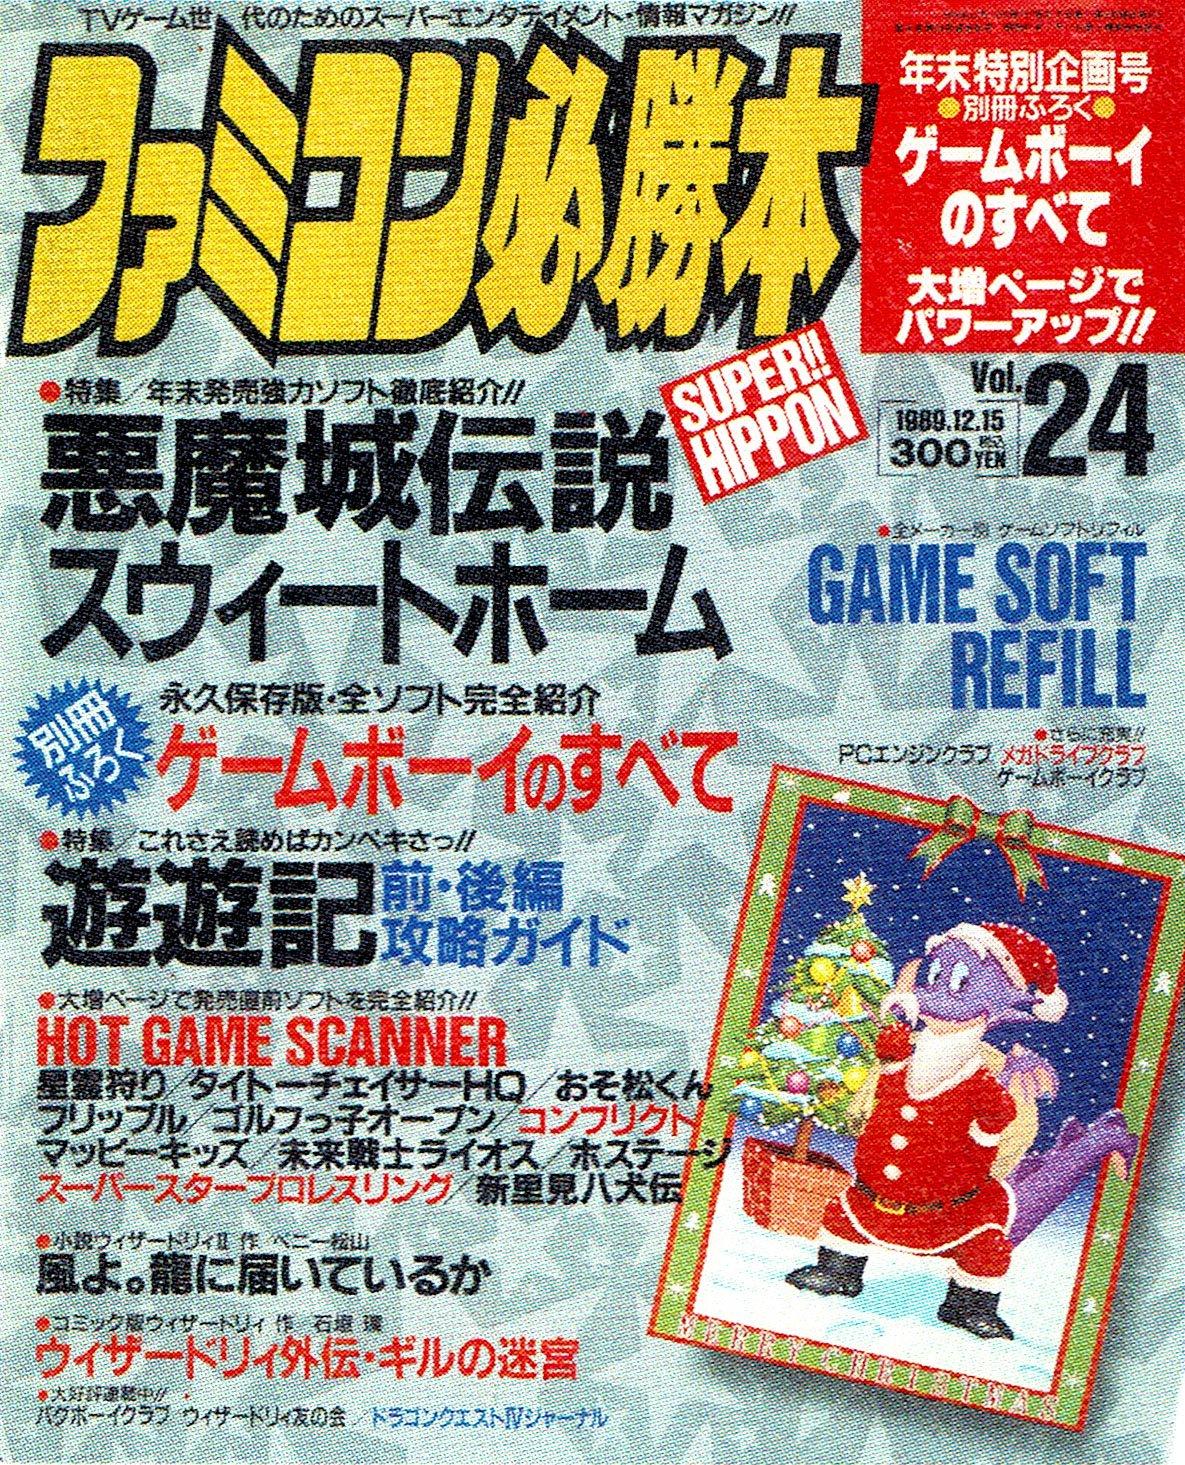 Famicom Hisshoubon Issue 085 (December 15, 1989)